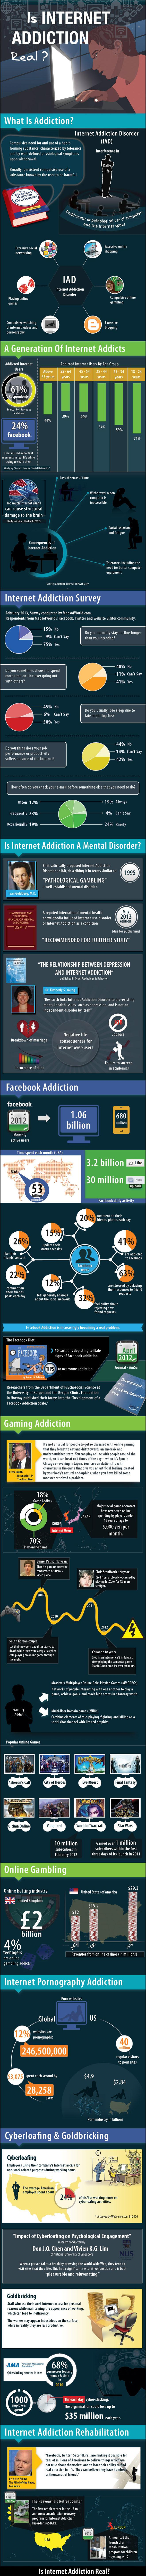 internet-addiction-facts-infographic